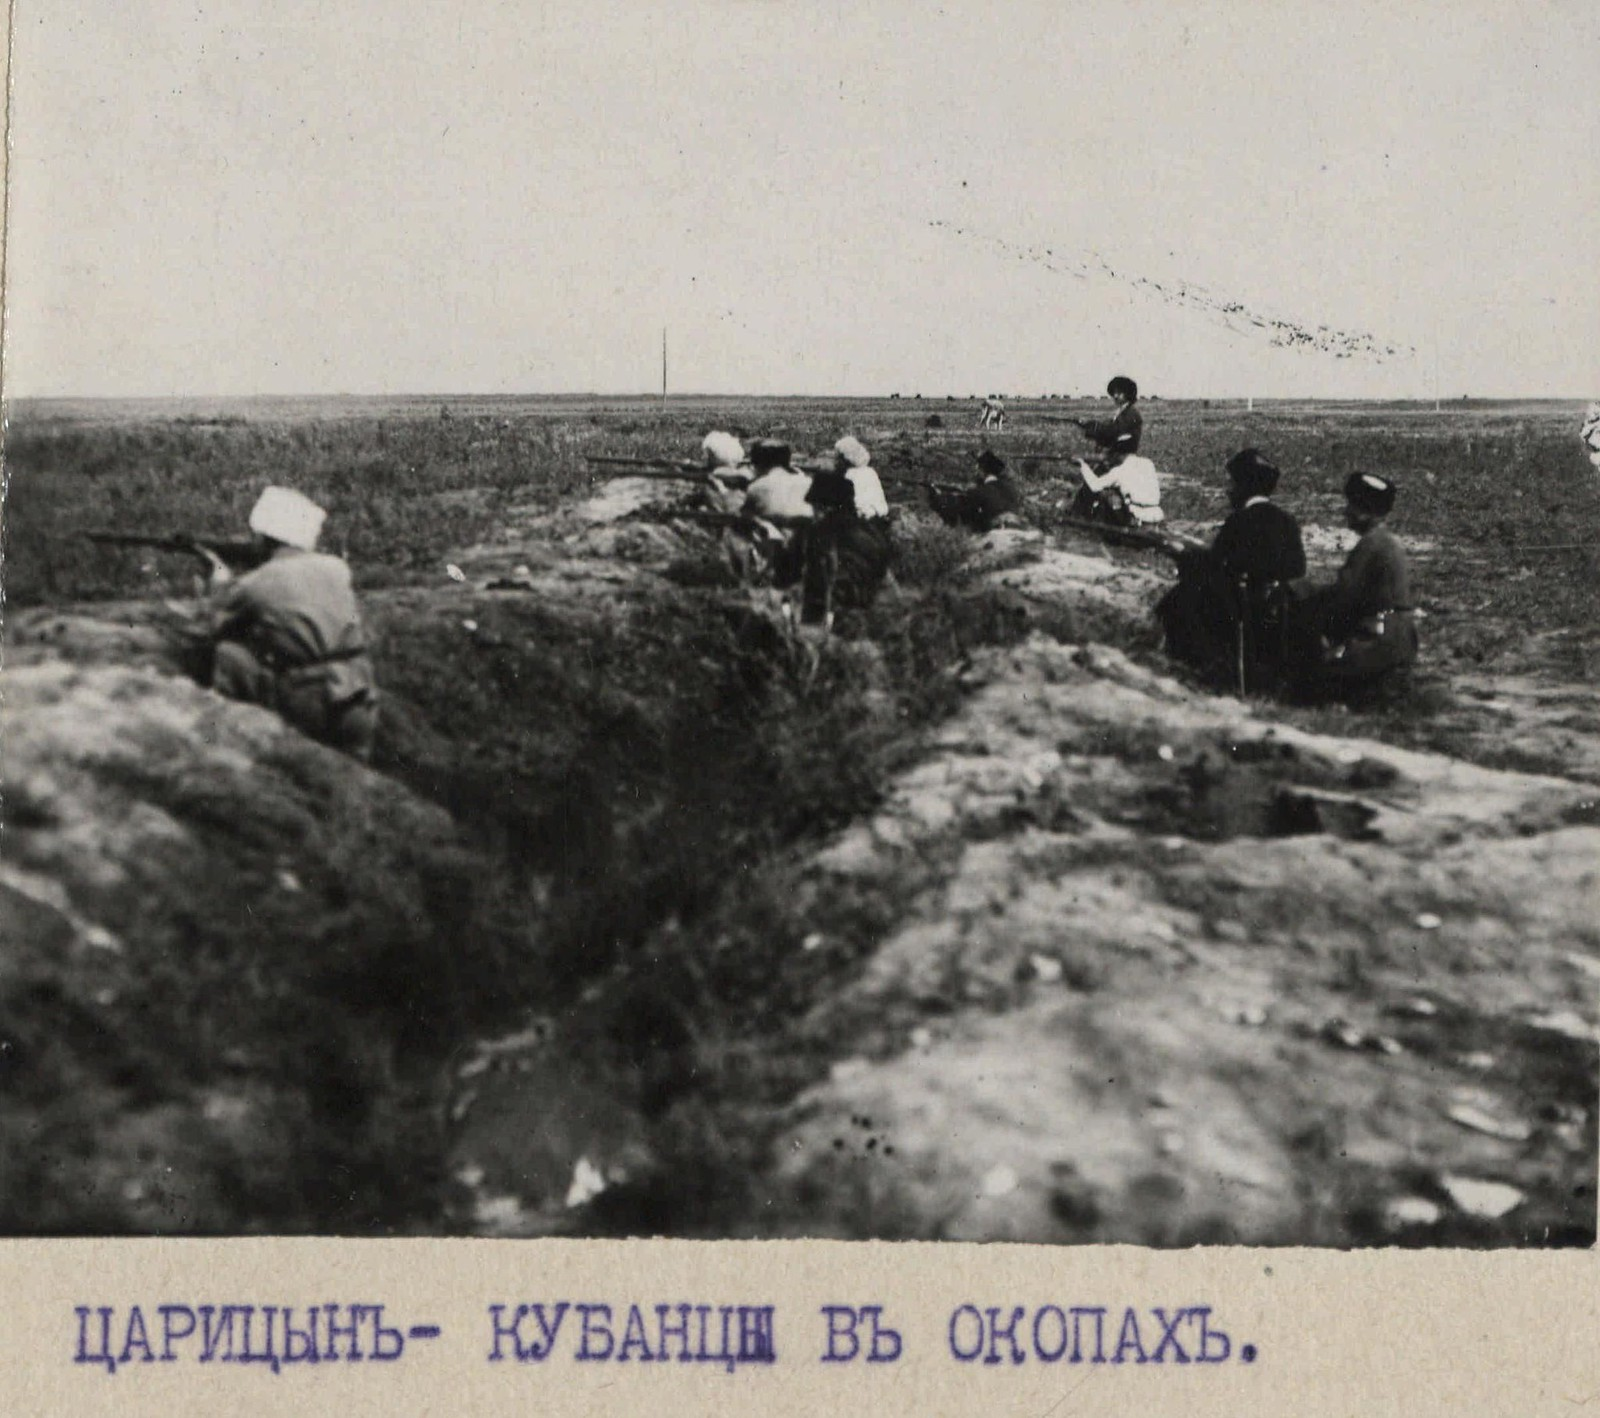 1919. Царицын. Кубанцы в окопах